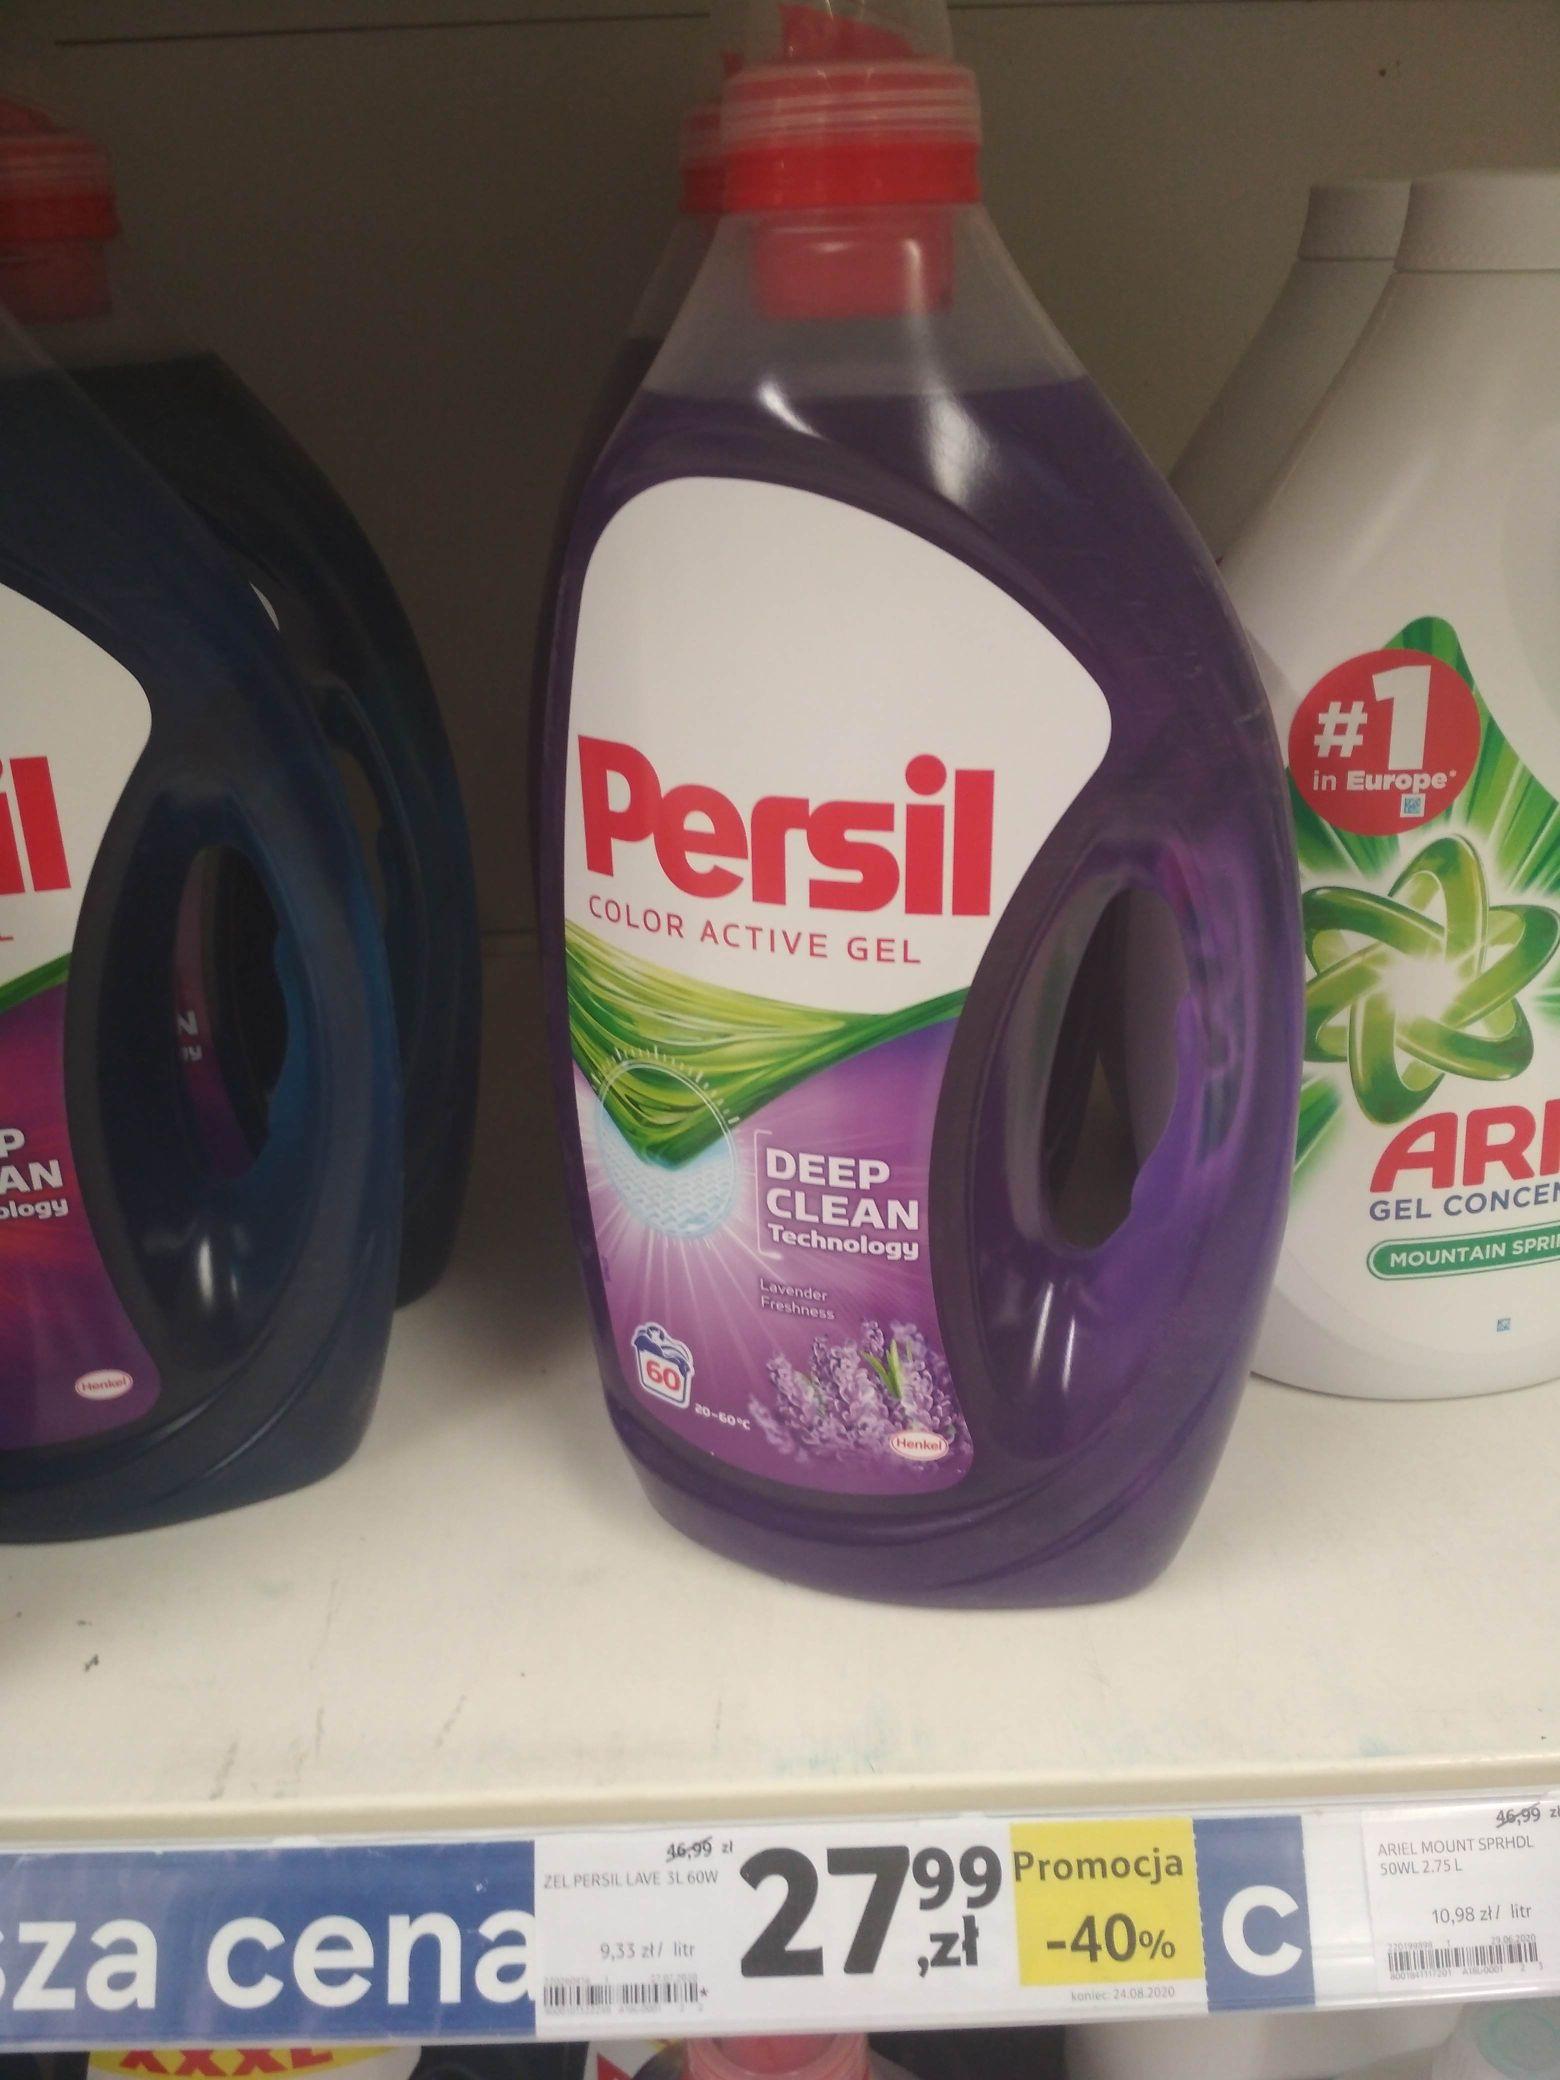 Żel do prania Persil Color Active Gel 60 pran, 3L